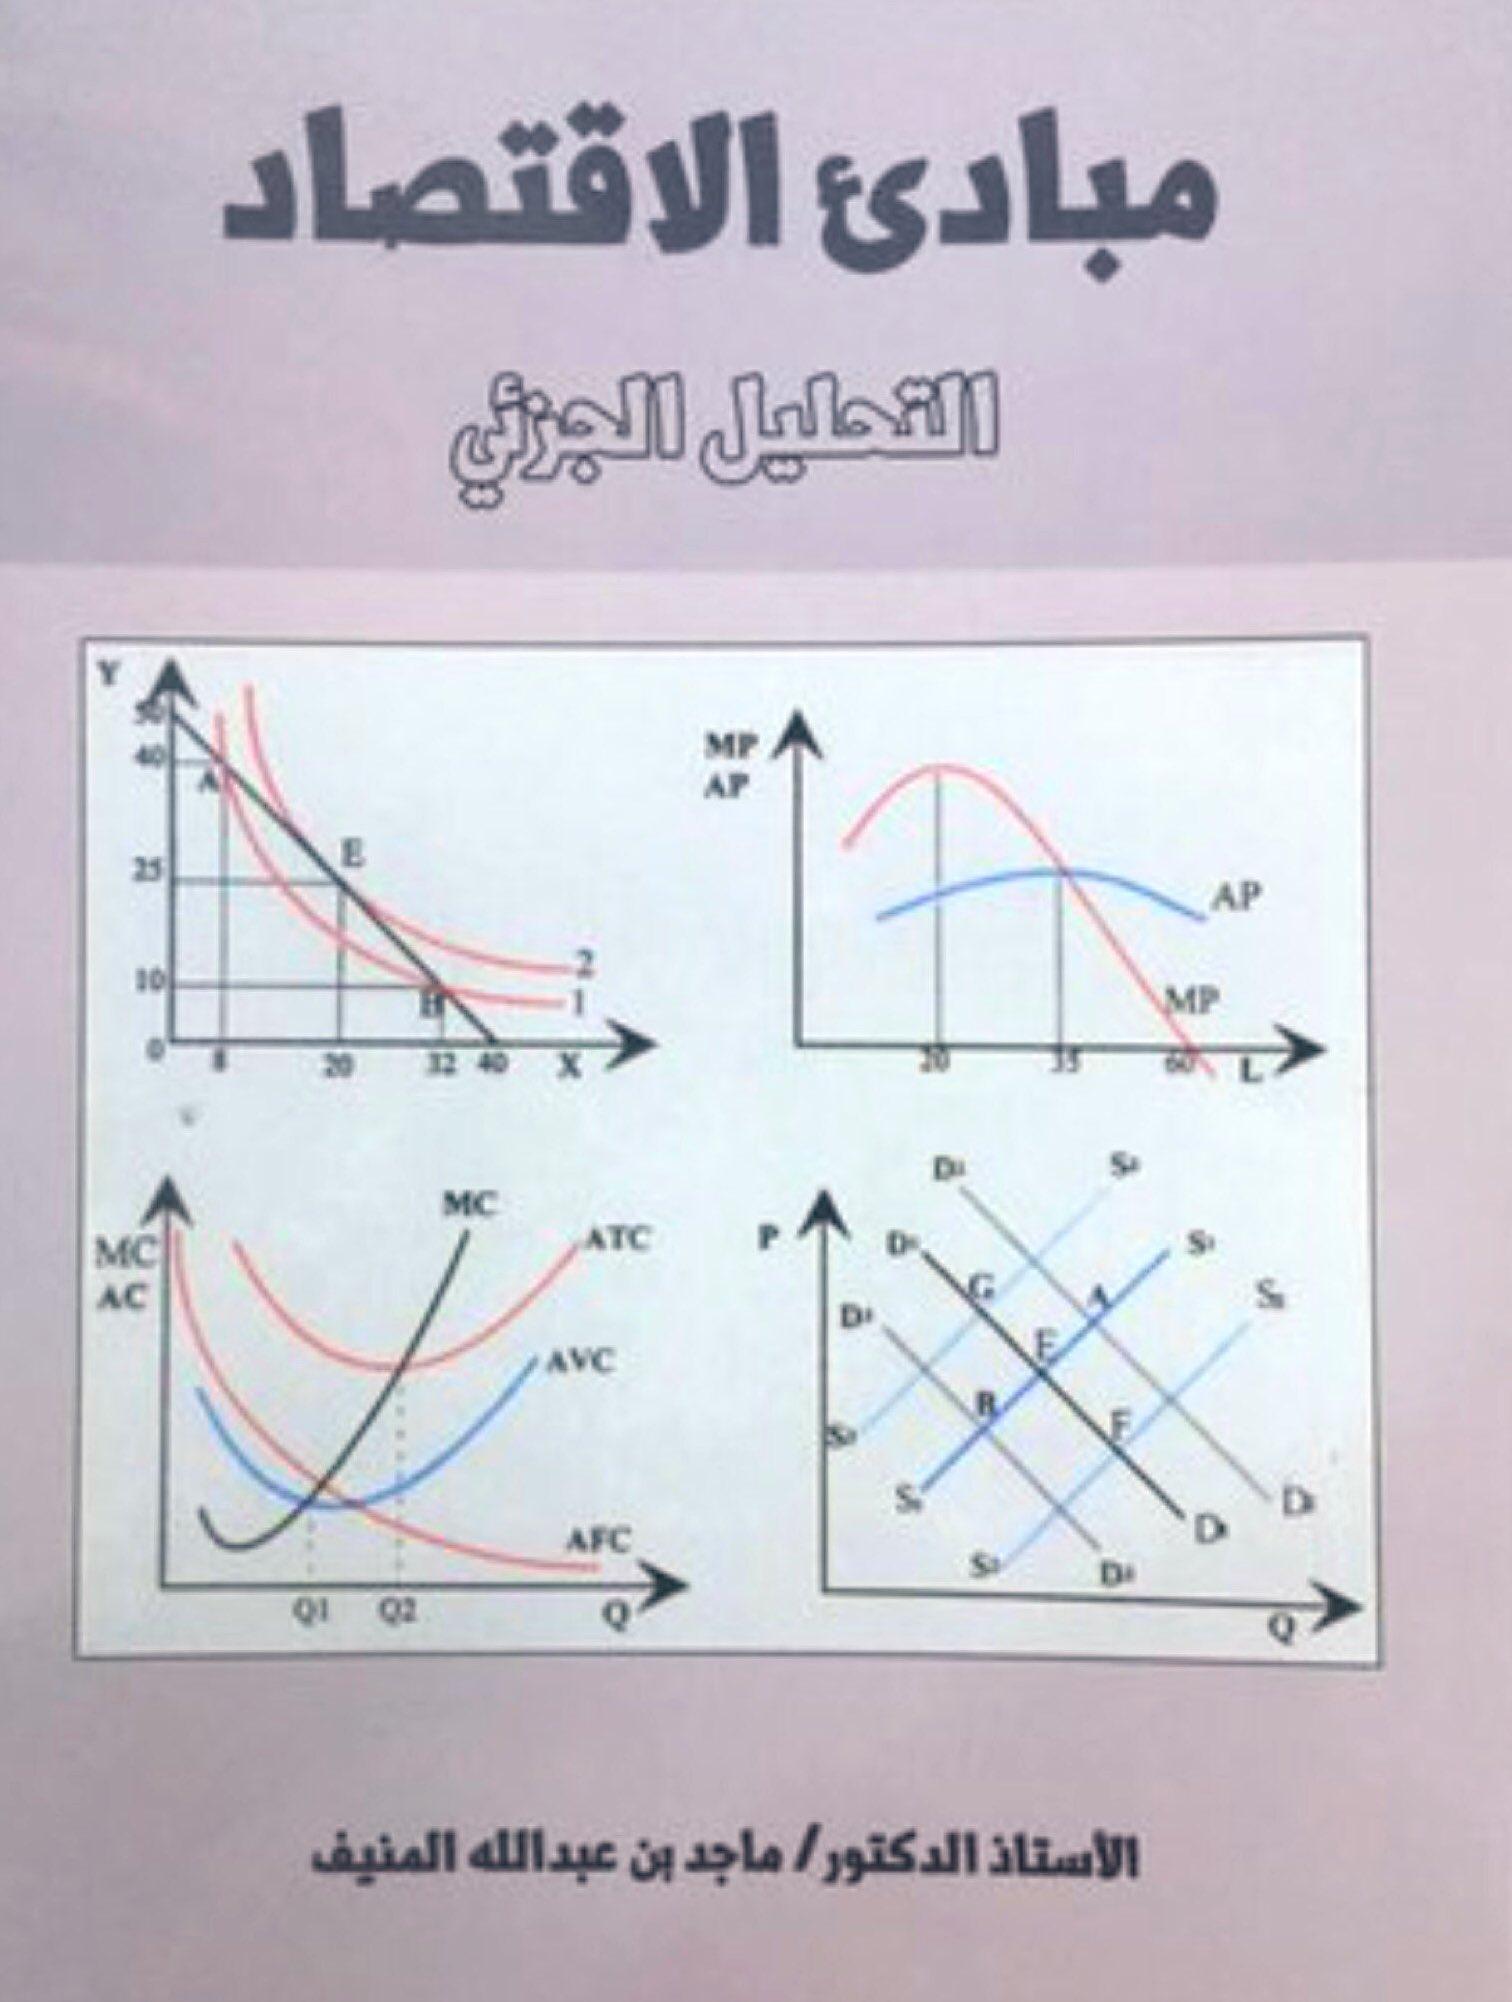 Dr Fahad Alsokhiry On Twitter المادة الحرة الوحيدة التي قمت بدراستها بمرحلة البكالوريوس من خارج كلية الهندسة كانت مادة عن الاقتصاد وكان الكتاب المقرر كتاب مبادئ الاقتصاد التحليل الجزئي للدكتور ماجد المنيف